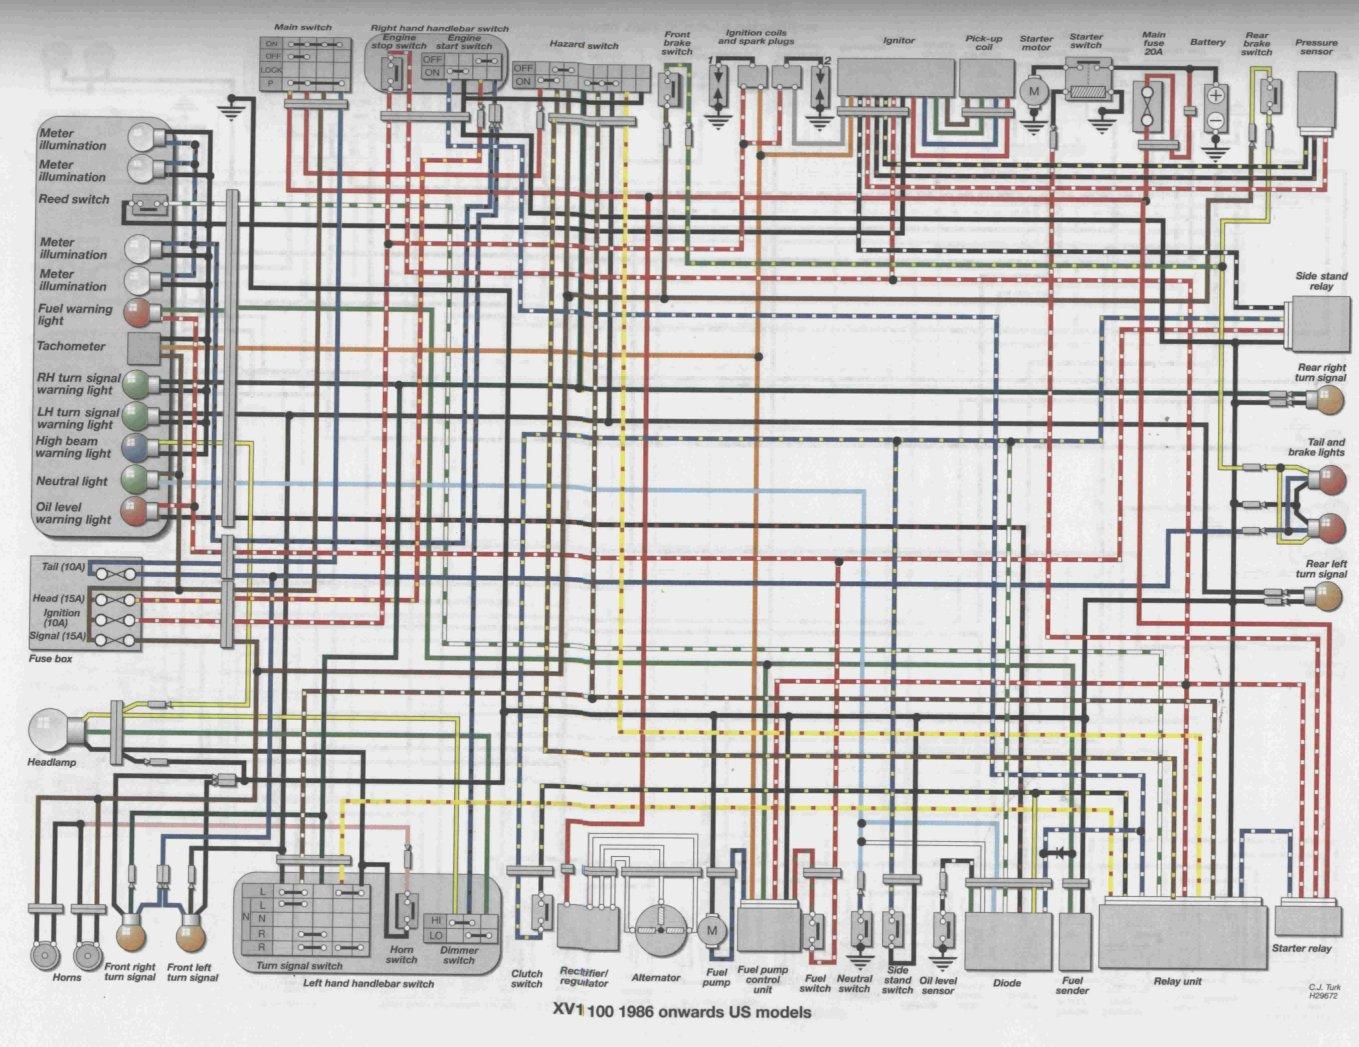 Tremendous 1980 Yamaha 650 Yics Wiring Diagrams Schematic Diagram Download Wiring Cloud Ittabpendurdonanfuldomelitekicepsianuembamohammedshrineorg